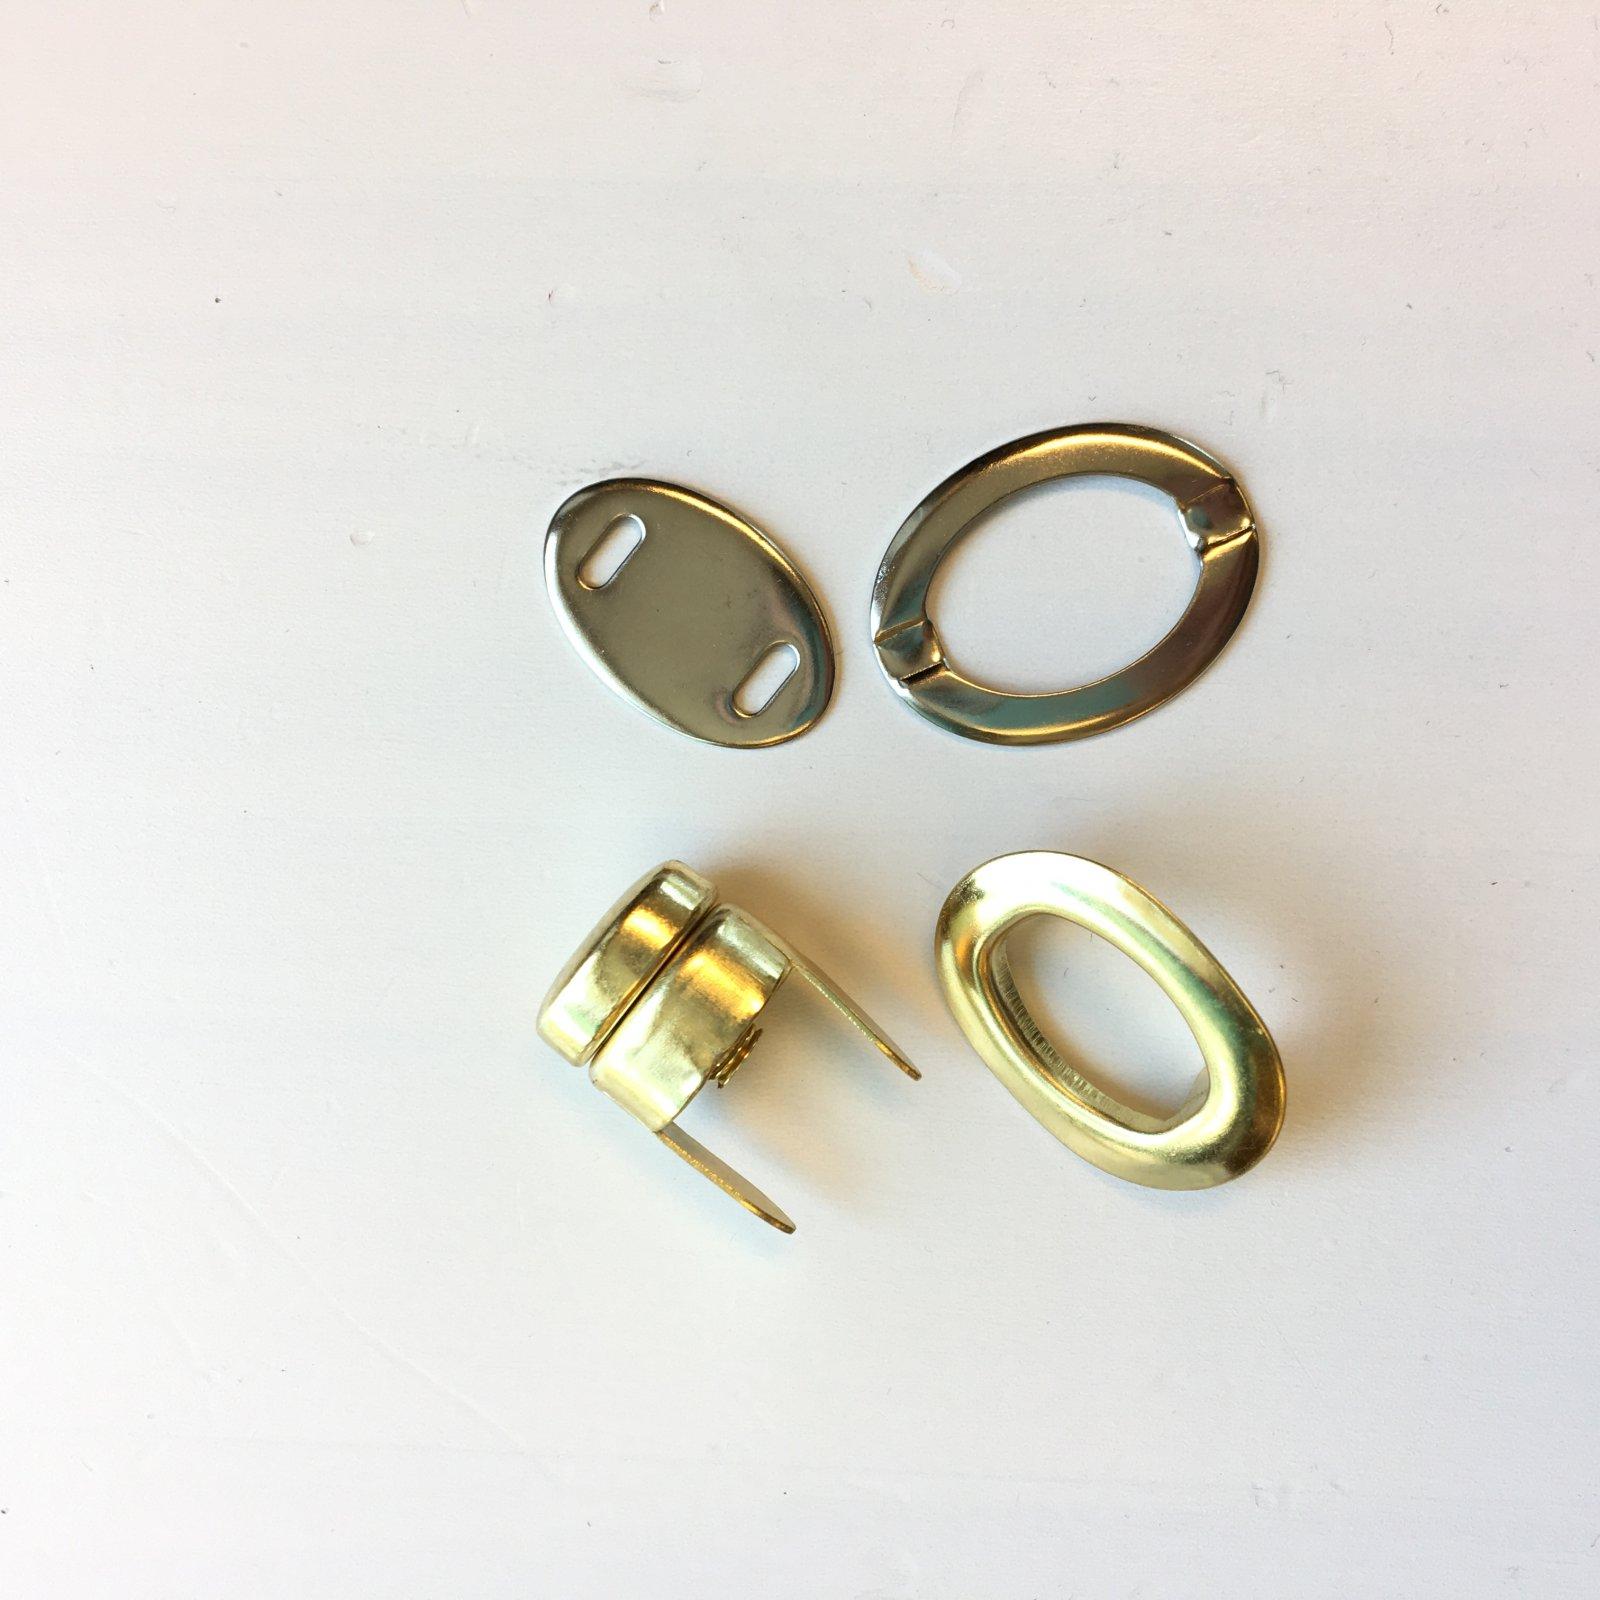 5/8 Gold Purse Twist Lock Closure